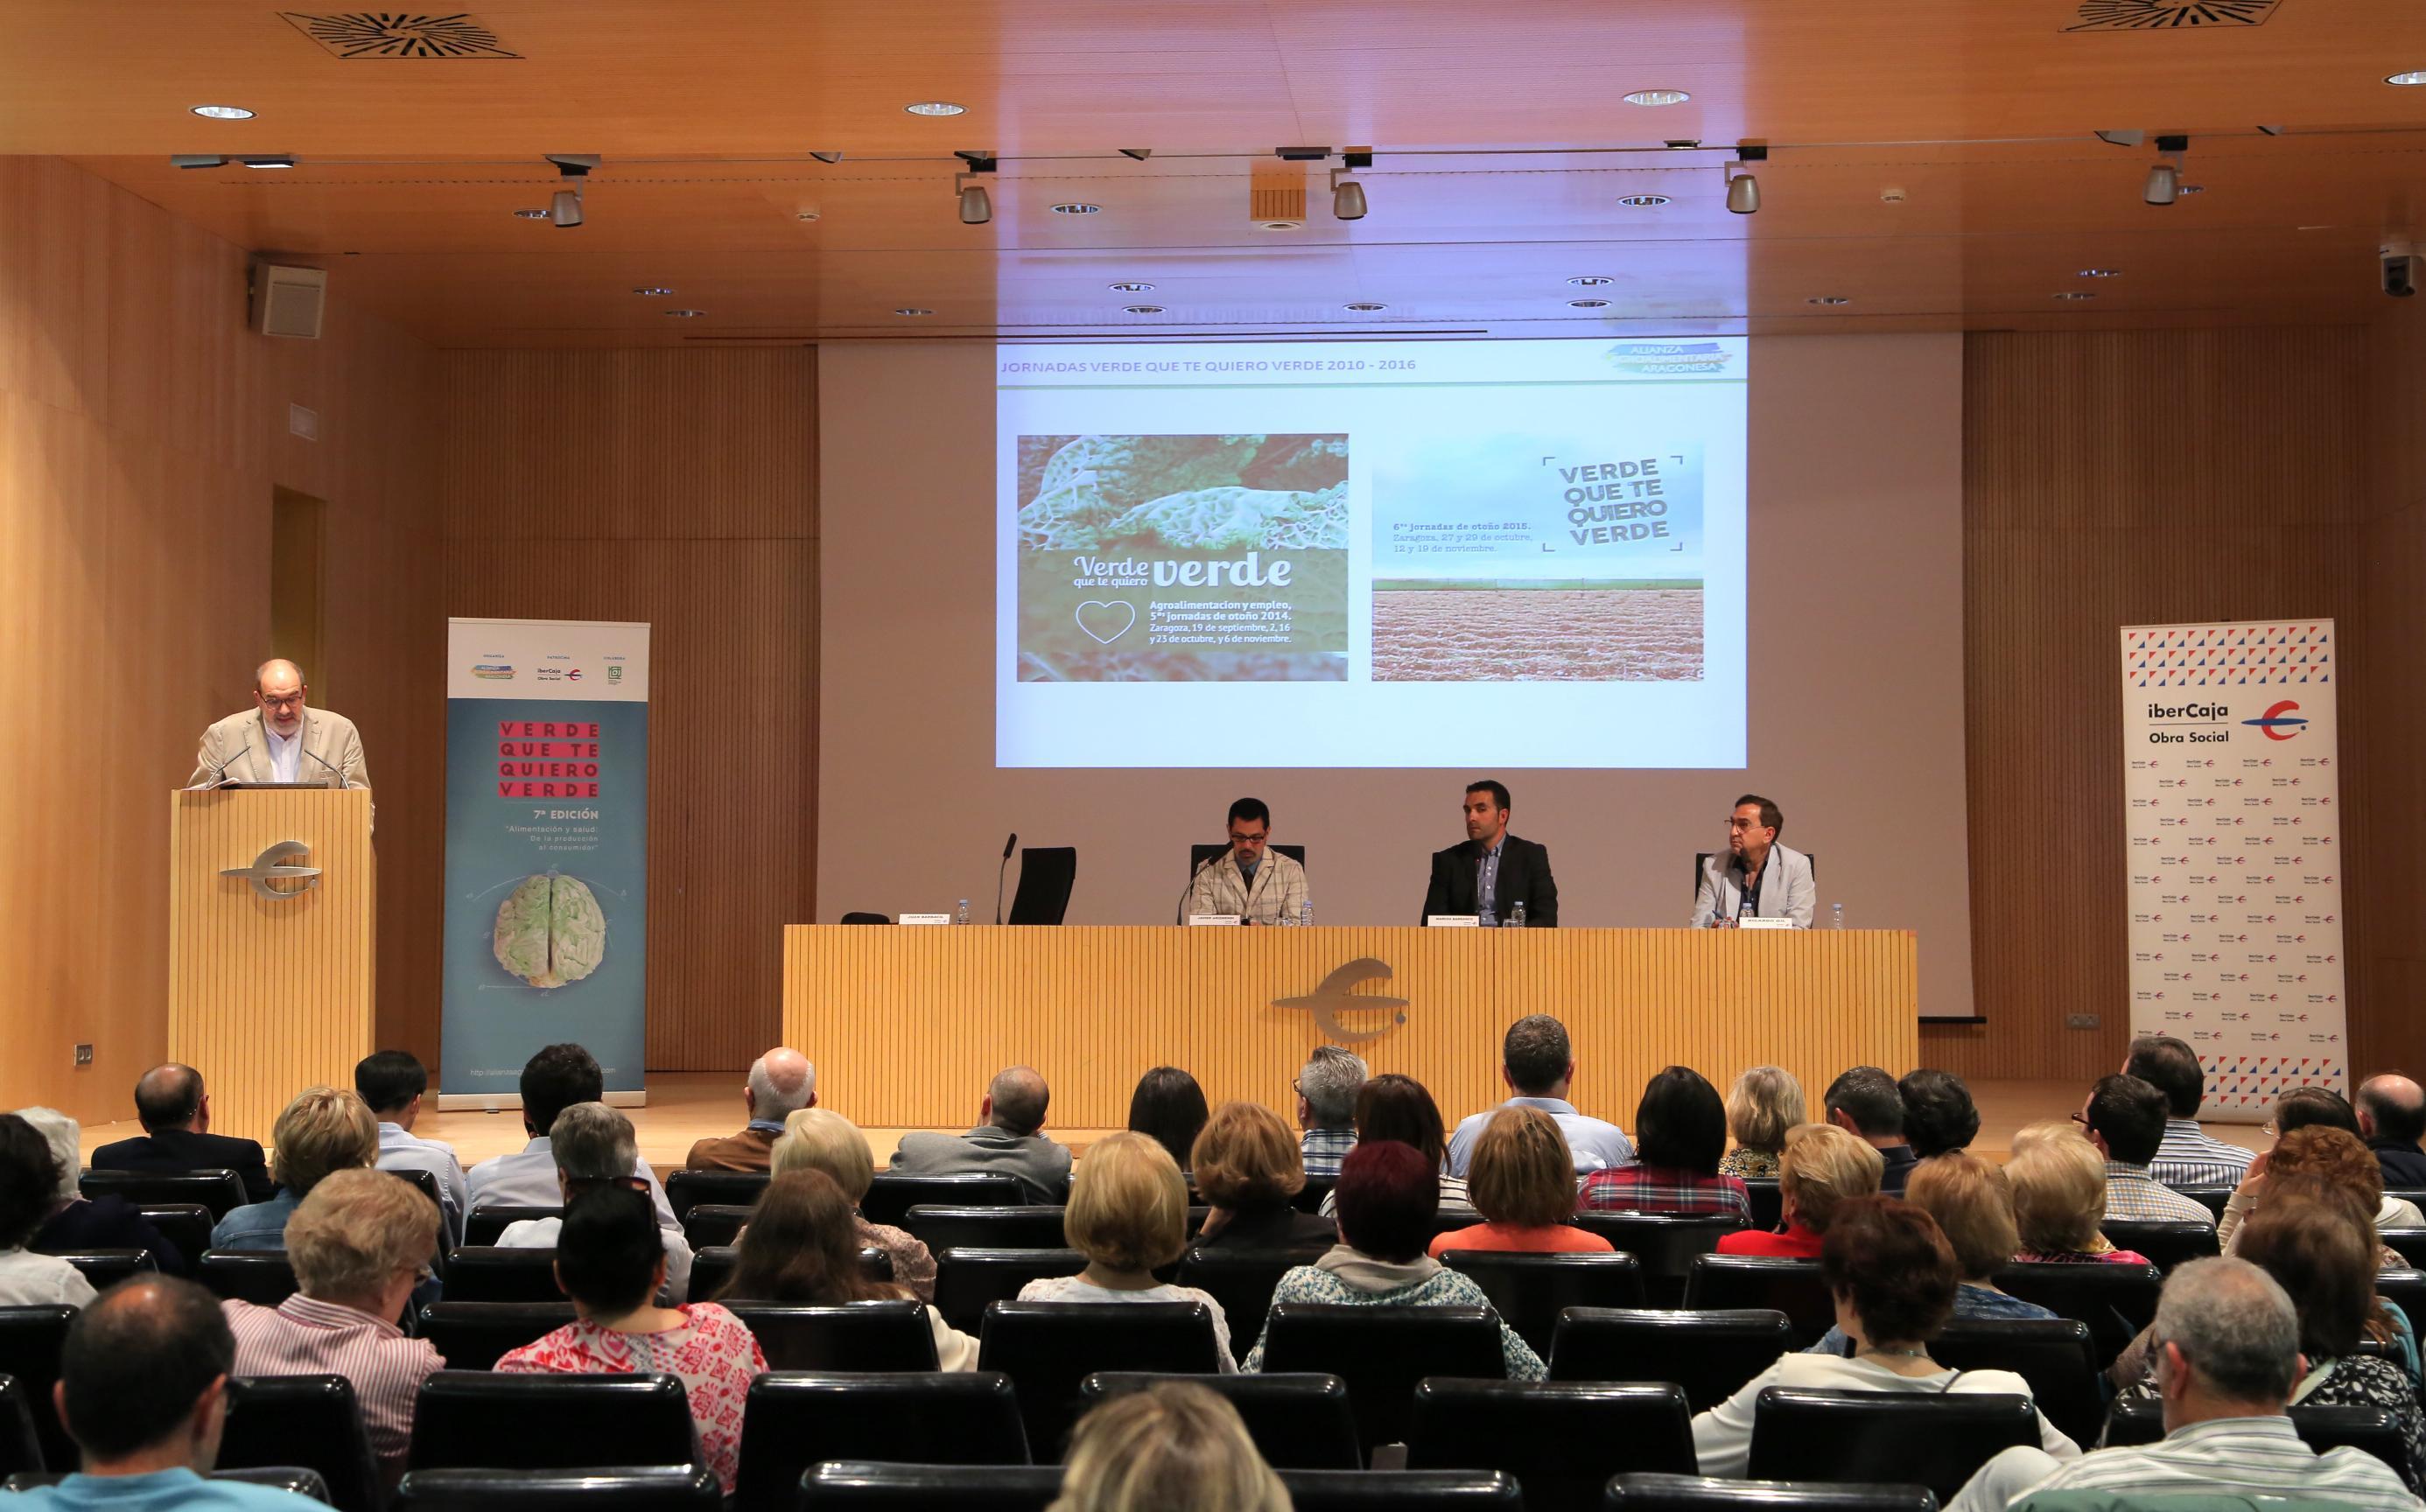 Juan Barbacil, Comunicador de la Alianza Agroalimentaria Aragonesa